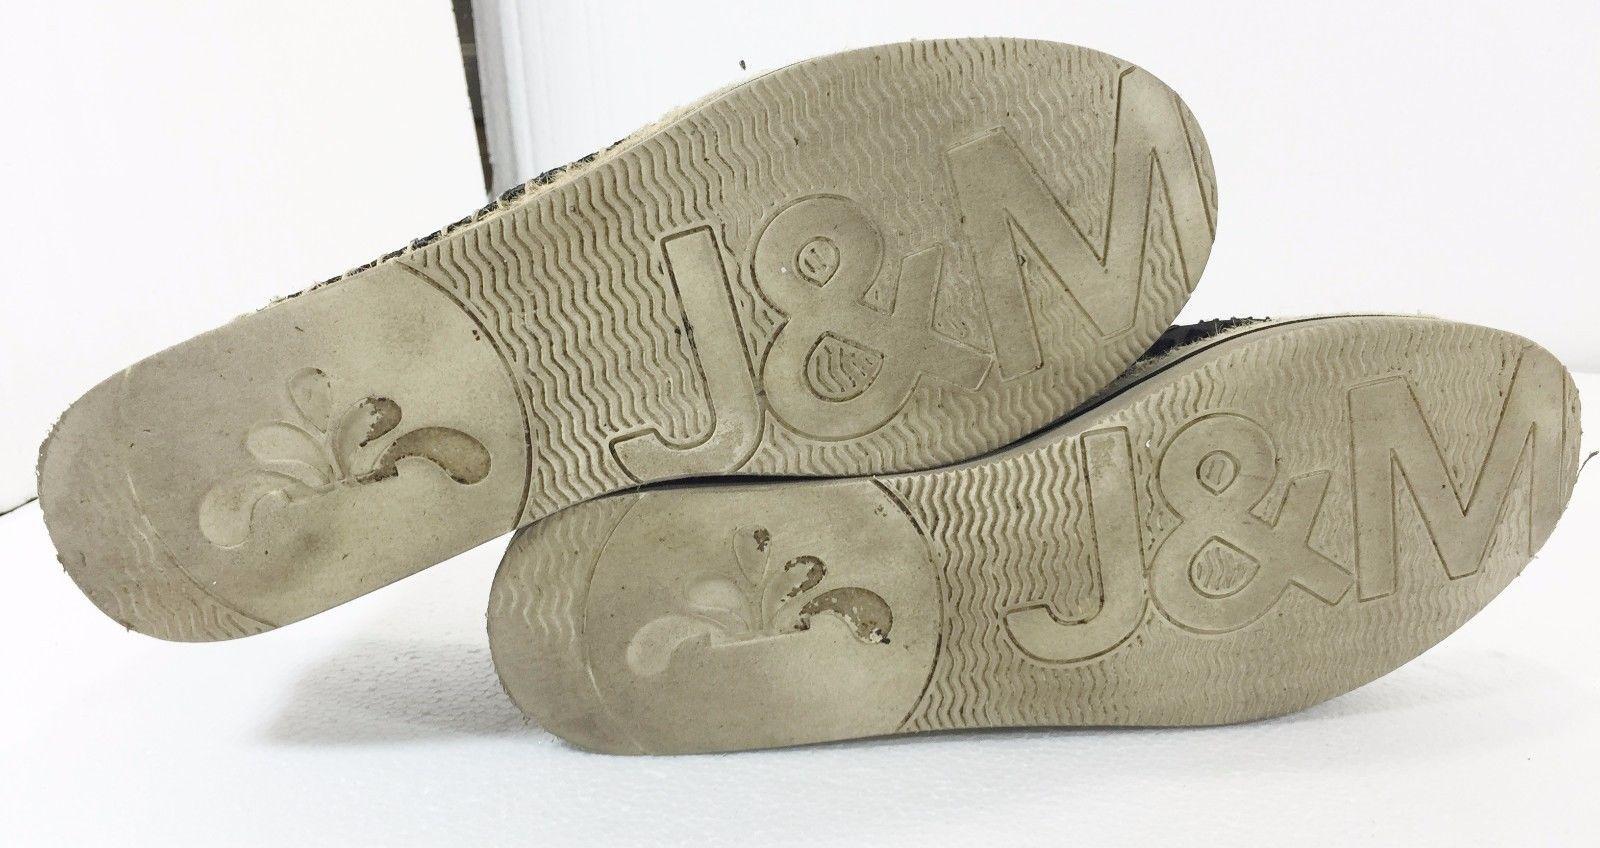 Joy & Mario Womens 7.5 W Black Fabric Flat Slip-On Shoes